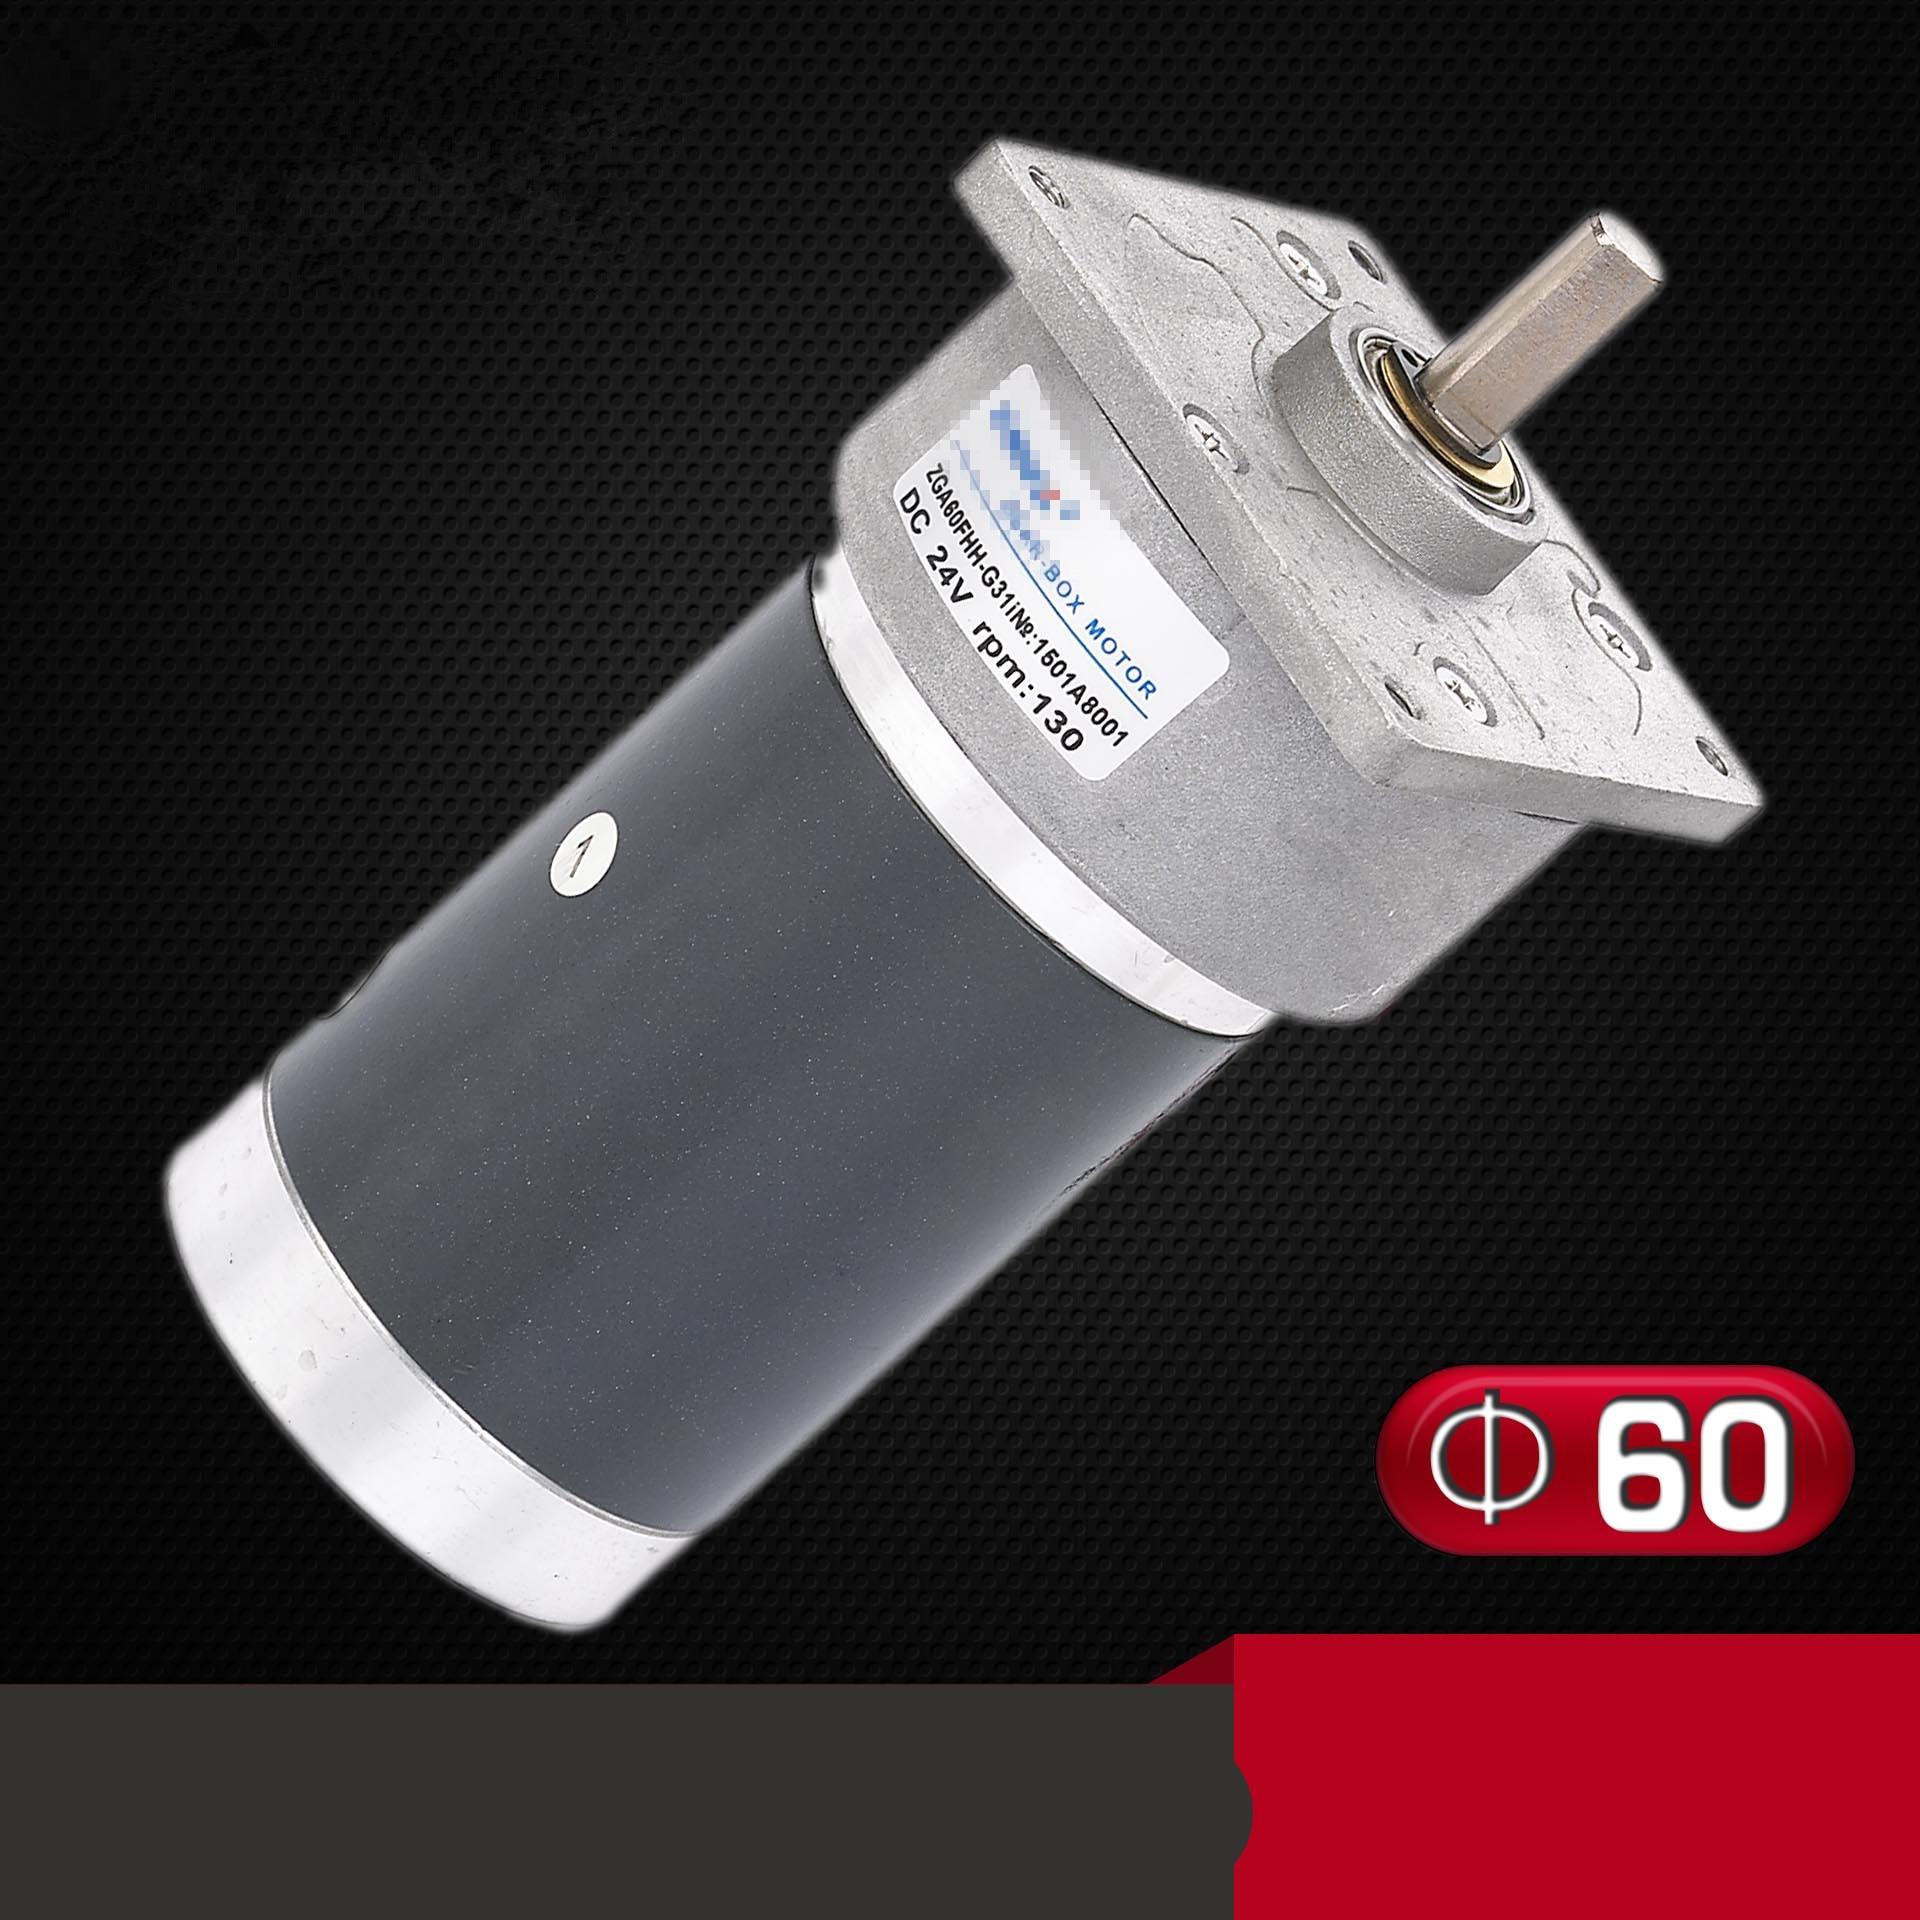 цена на ZGA60FHH-G Gear Motor 60mm Miniature DC Gear Motor 12V 24V Output Shaft 10RPM-1000RPM